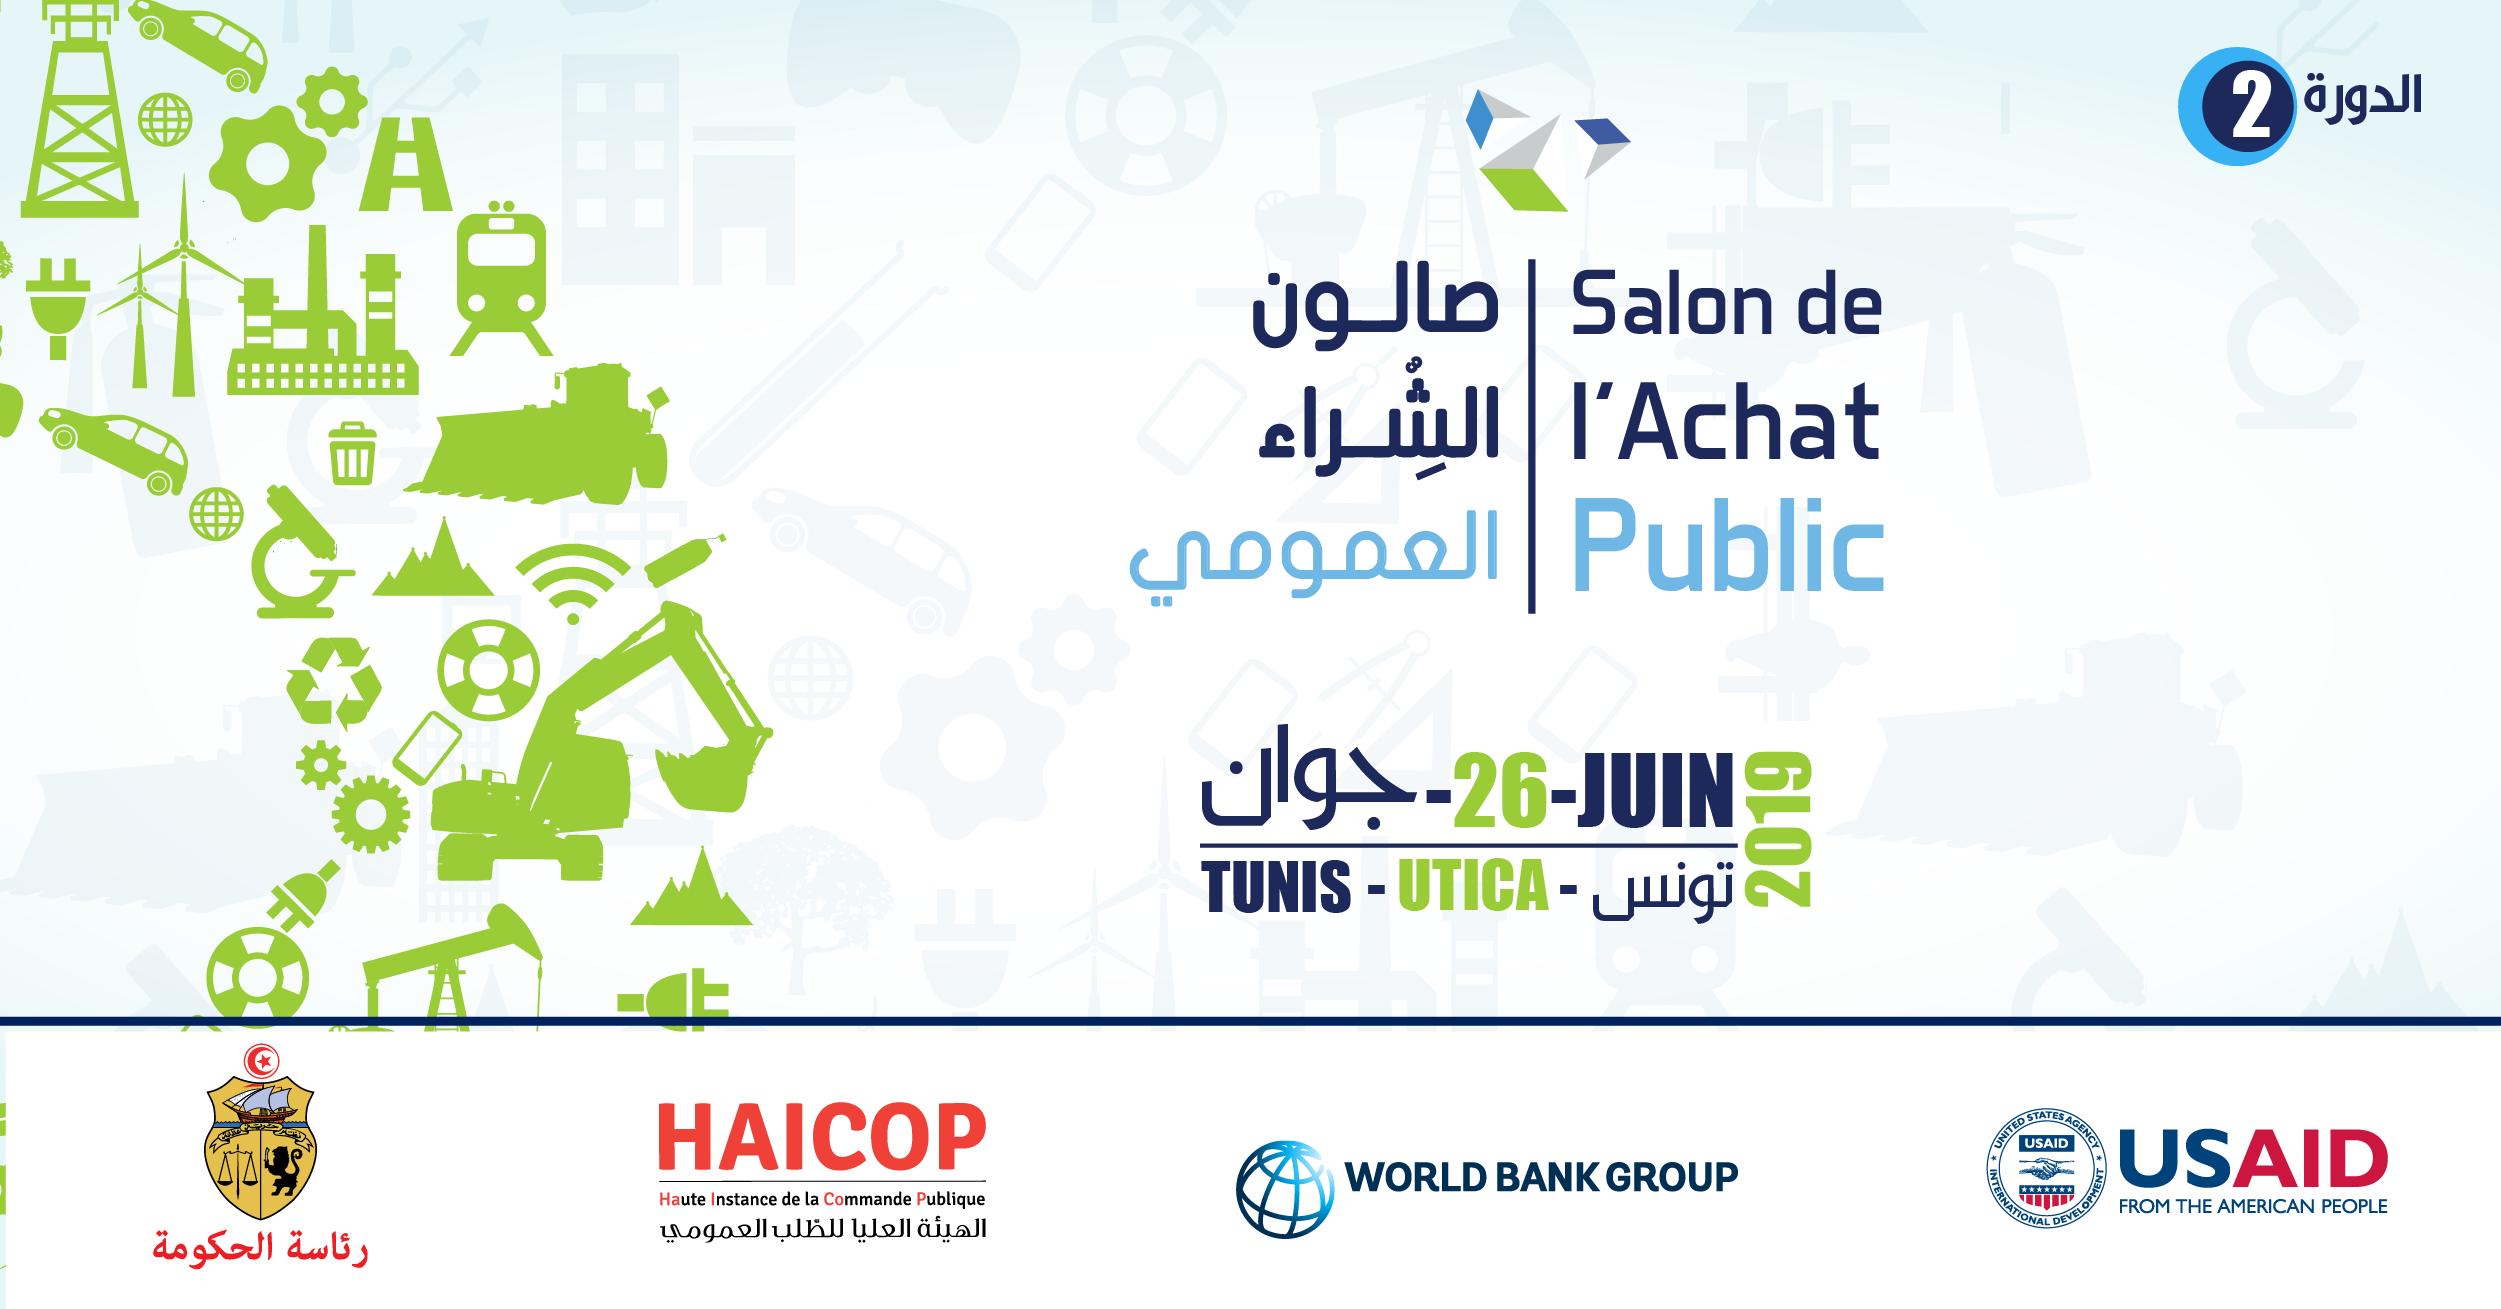 Salon de l'Achat Public 26 Juin 2019 – UTICA Tunis